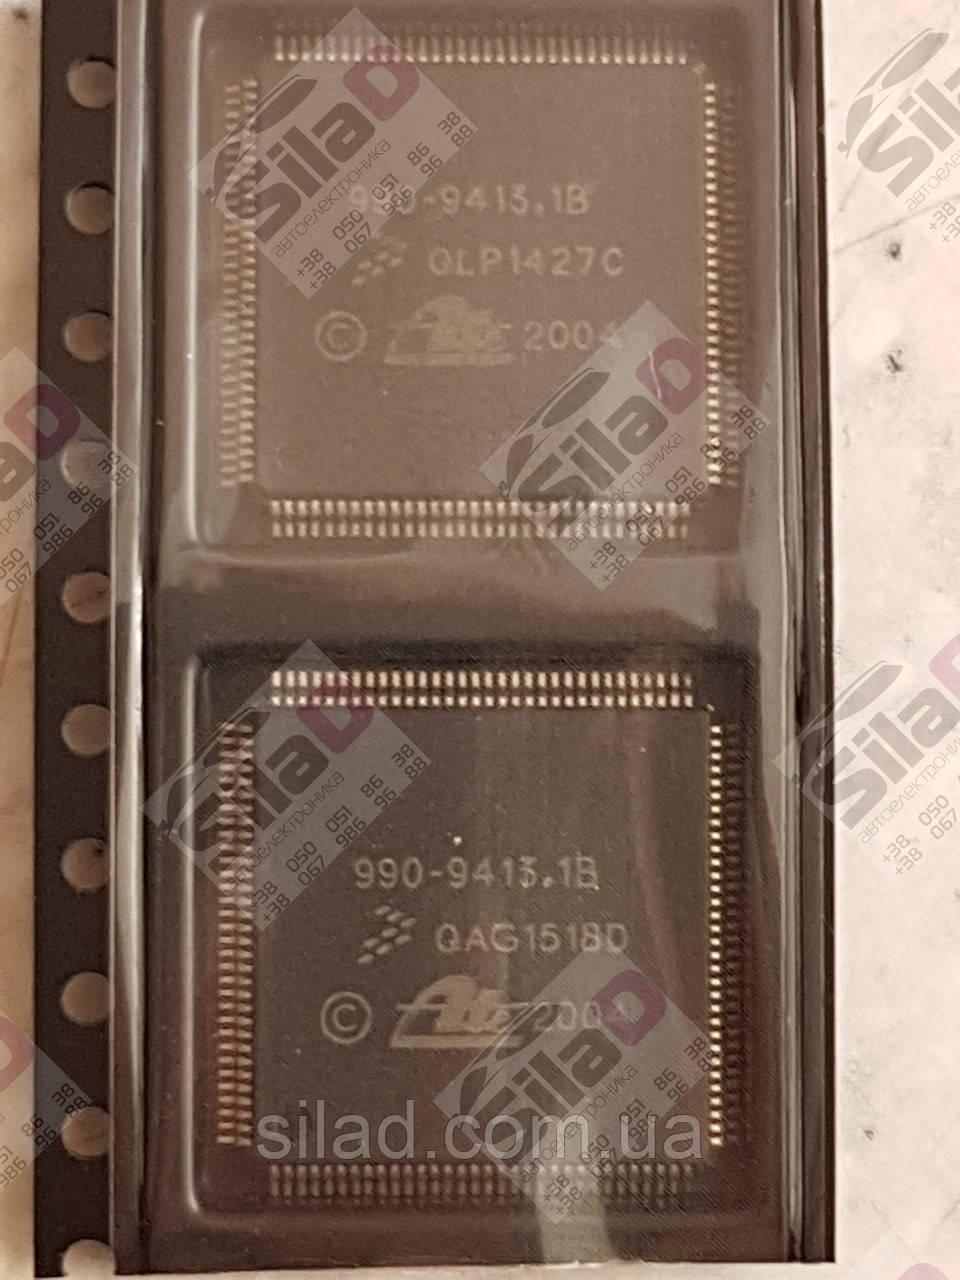 Процесор 990-9413.1 B ATE корпус QFP128